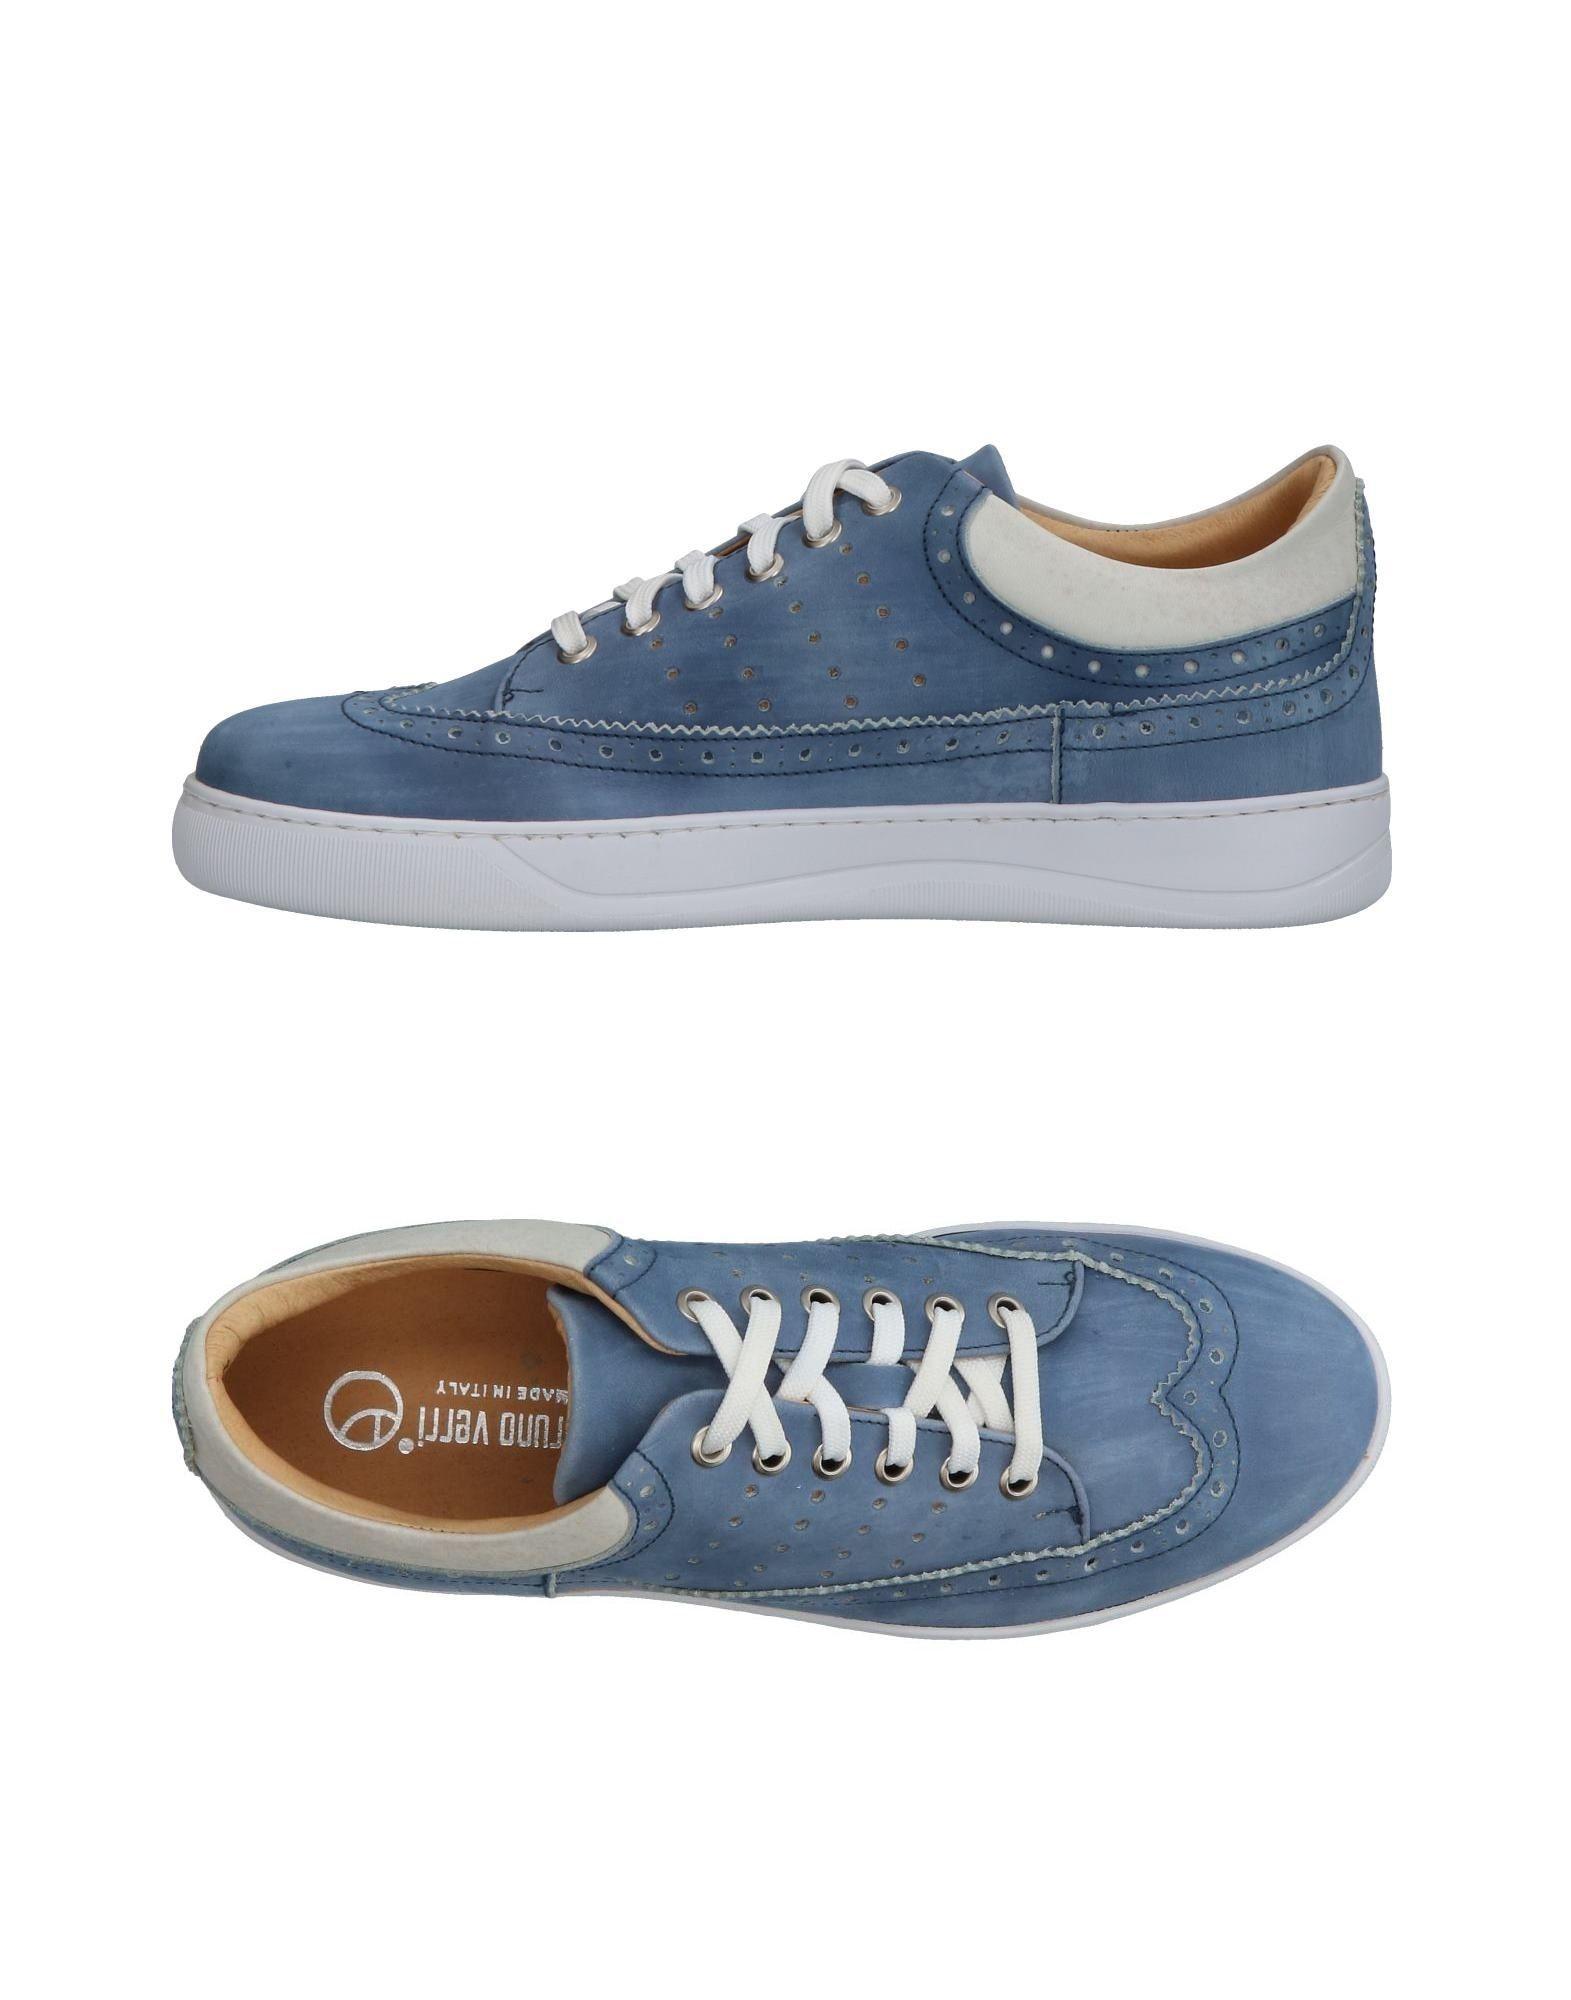 Sneakers Bruno Verri Homme - Sneakers Bruno Verri sur